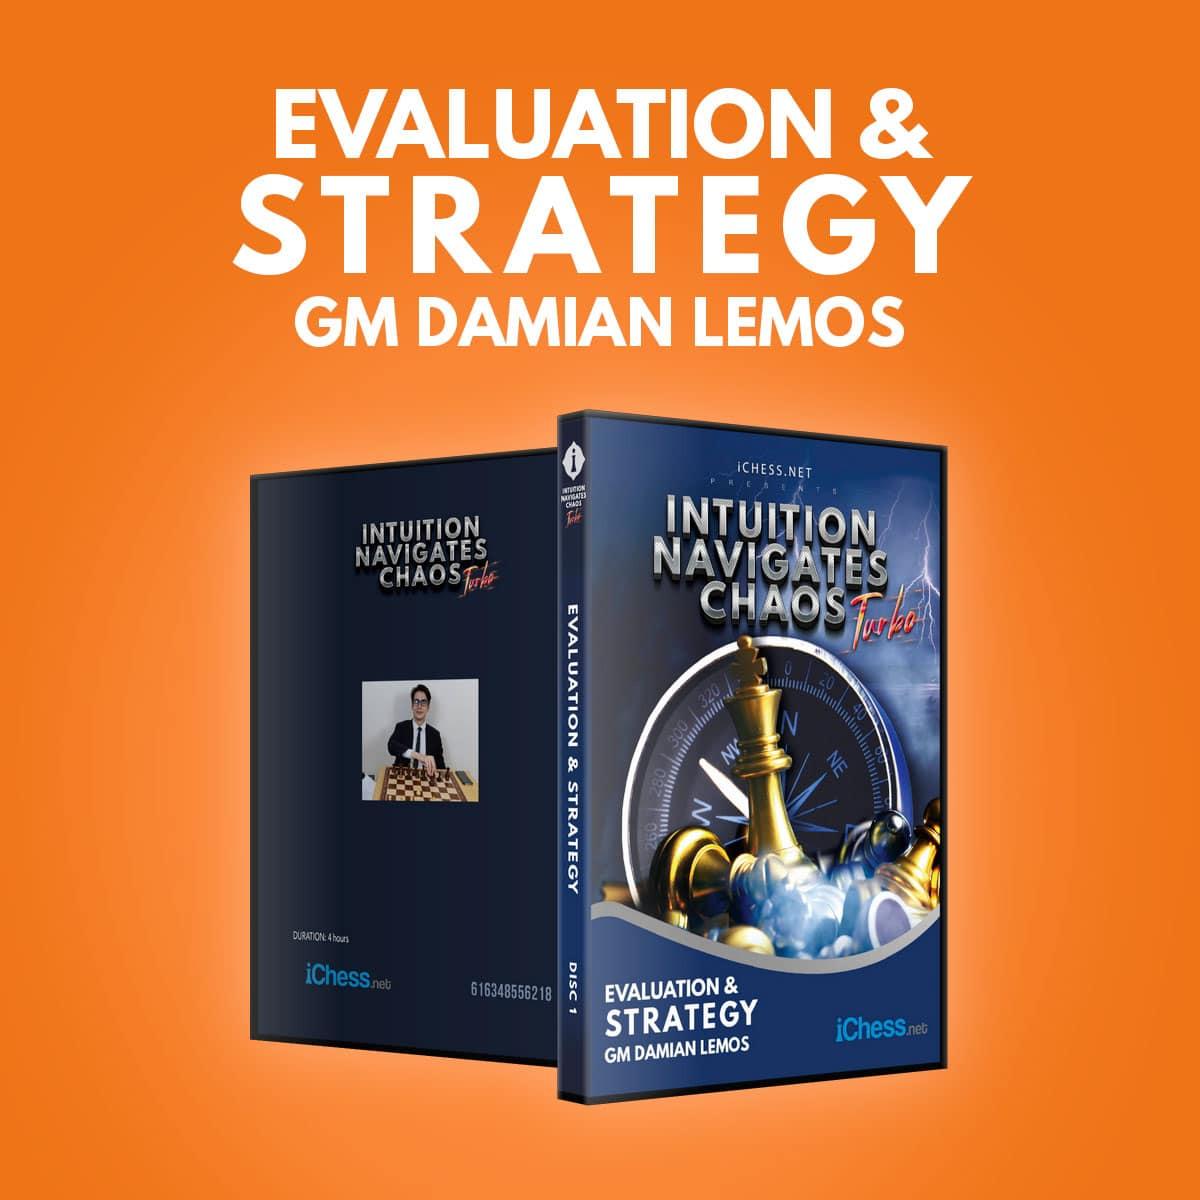 Evaluation and Strategy – GM Damian Lemos